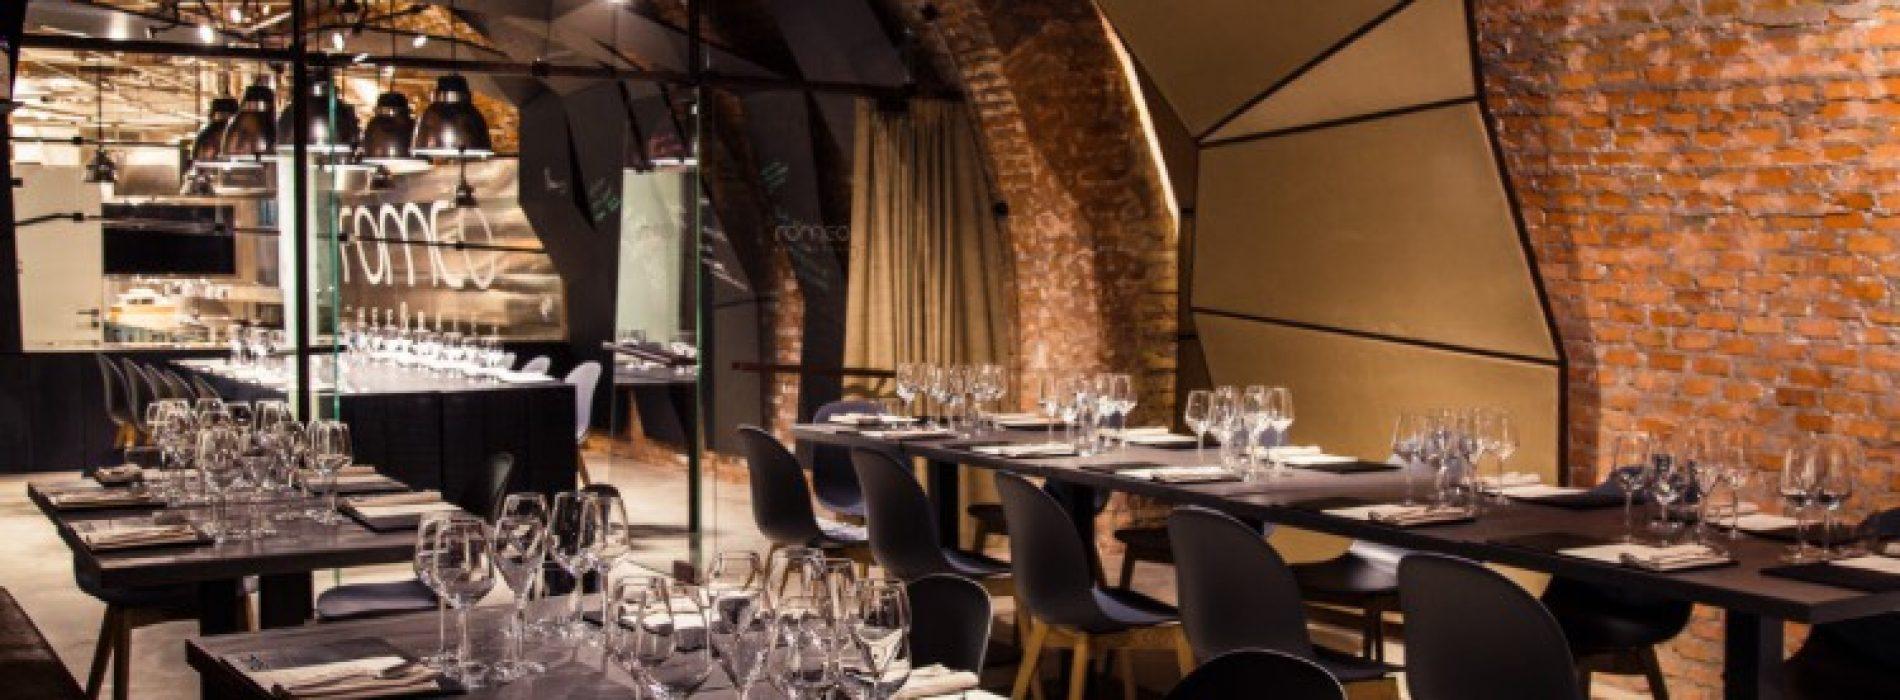 Romeo and Giulietta Rome: Bowerman's new restaurant, pizzeria and ice cream parlour in Testaccio